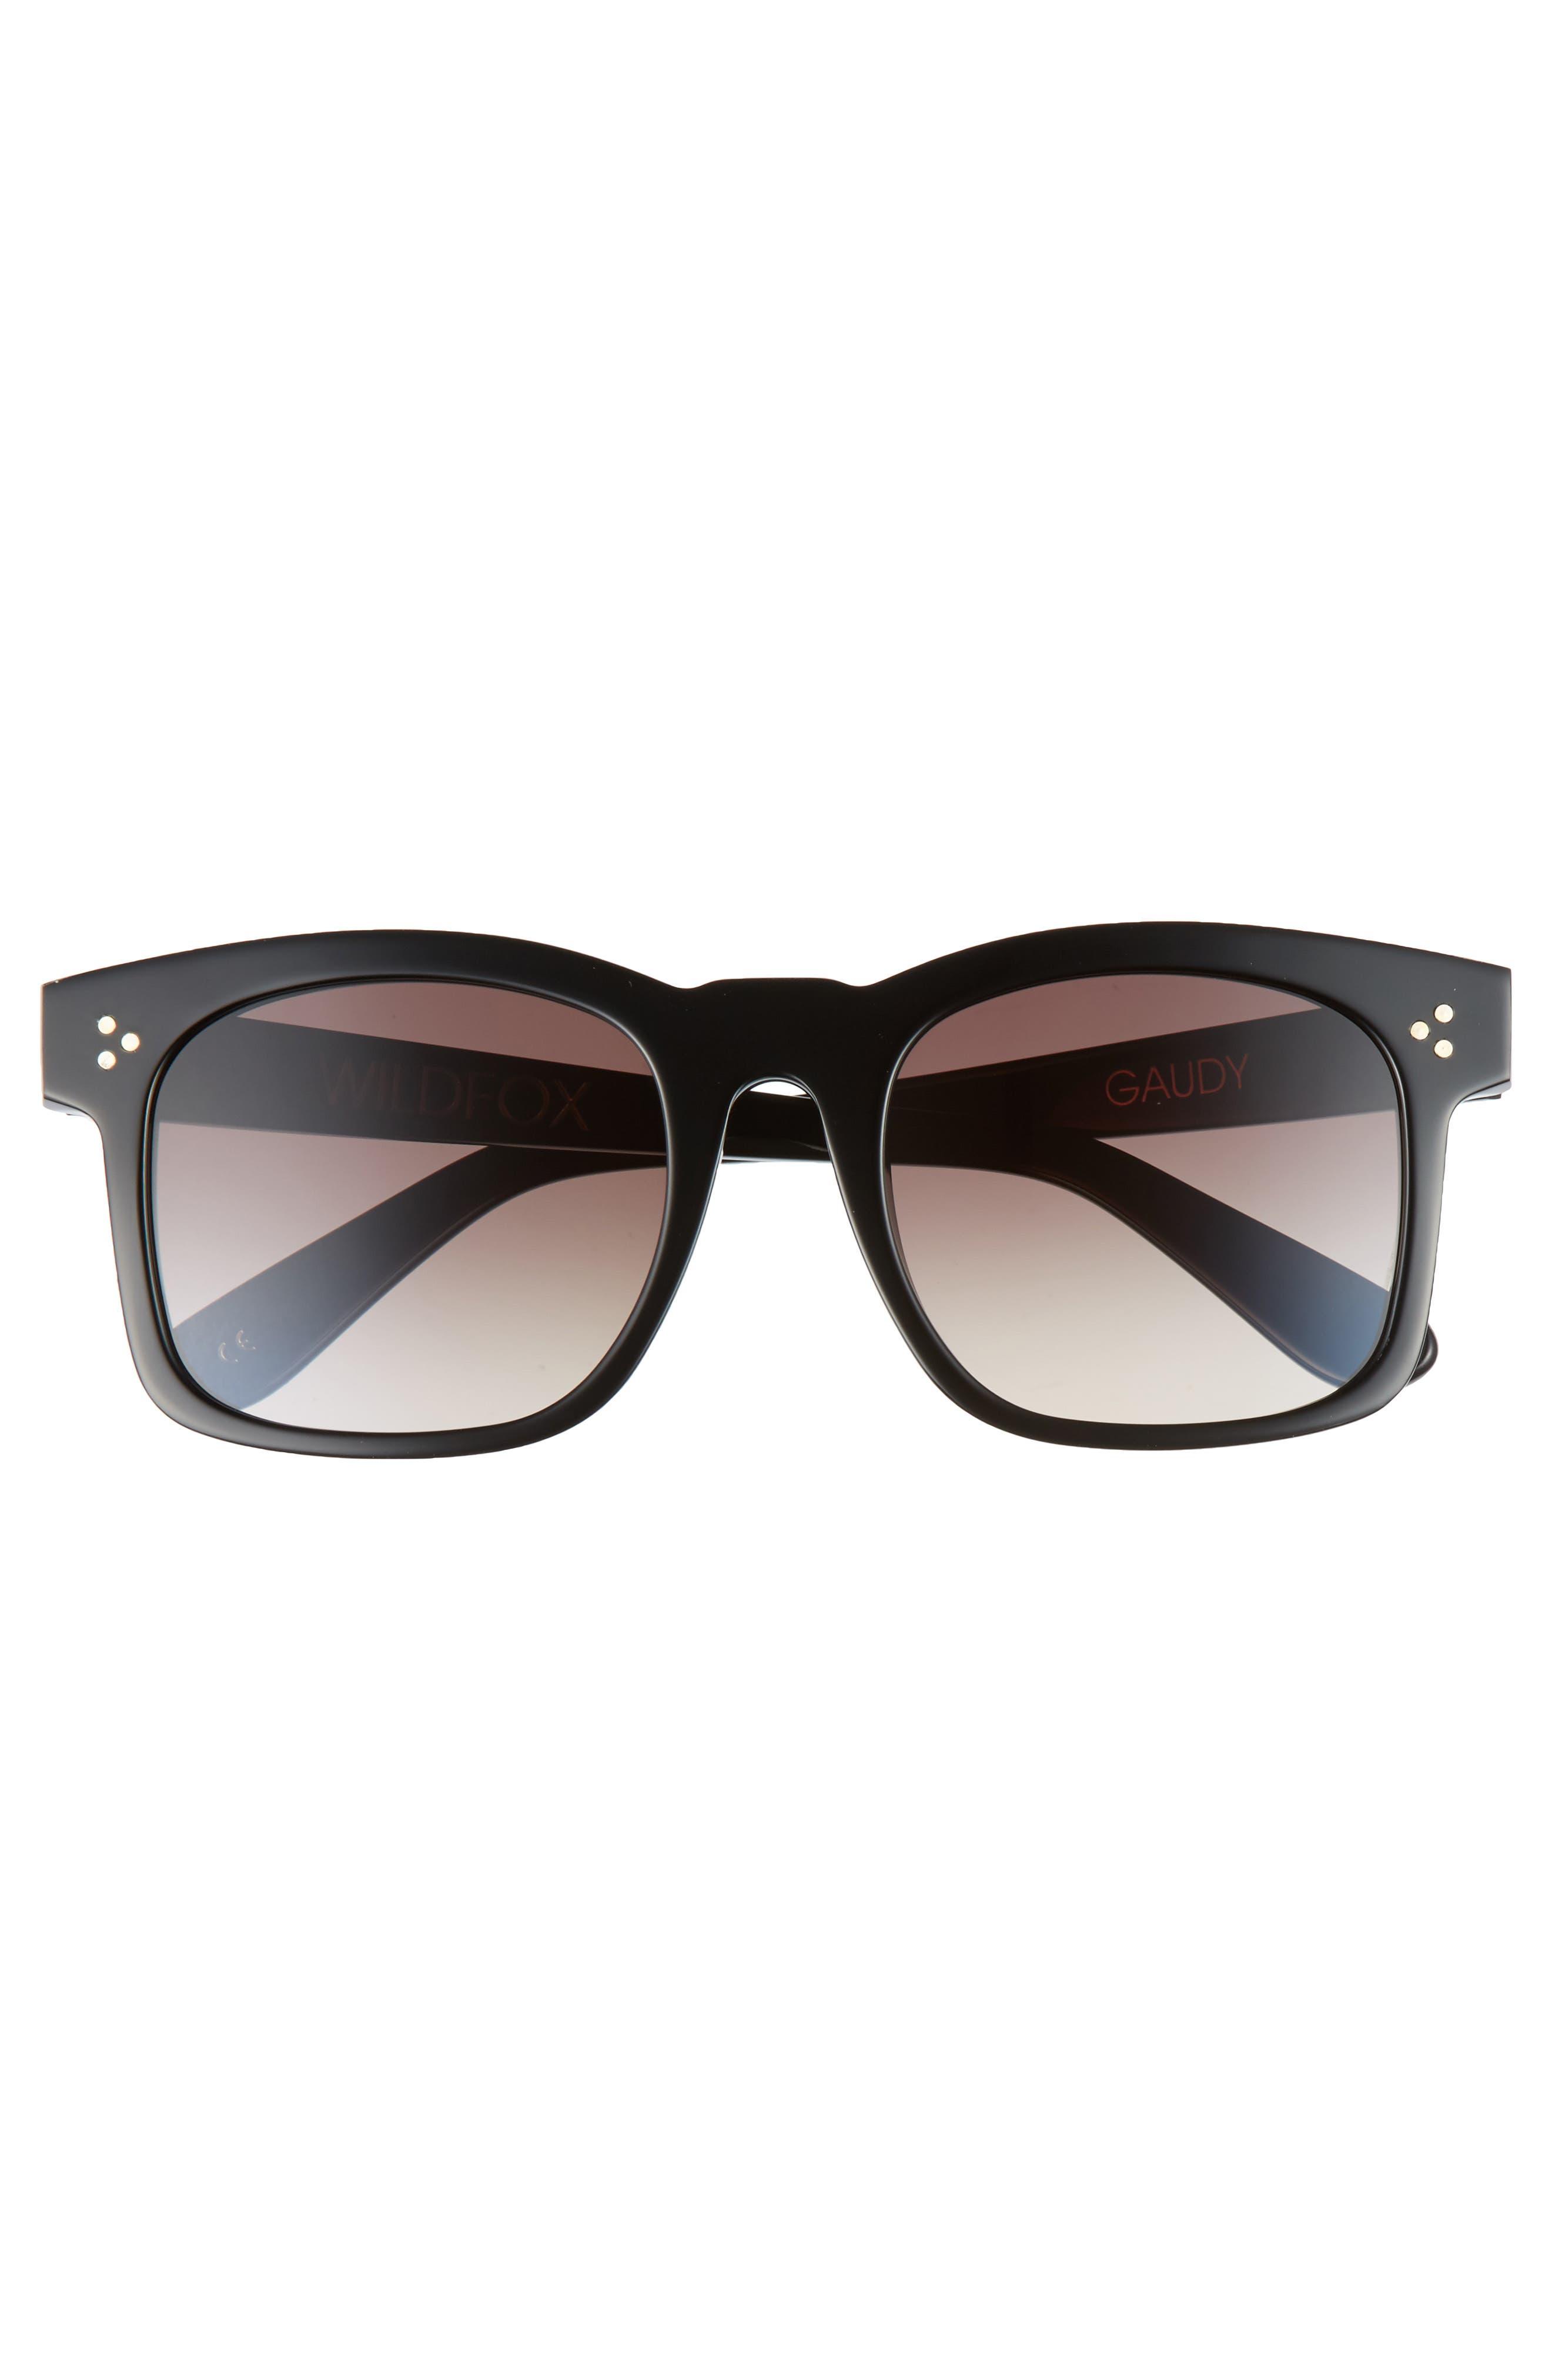 Gaudy Zero 51mm Flat Square Sunglasses,                             Alternate thumbnail 2, color,                             Black